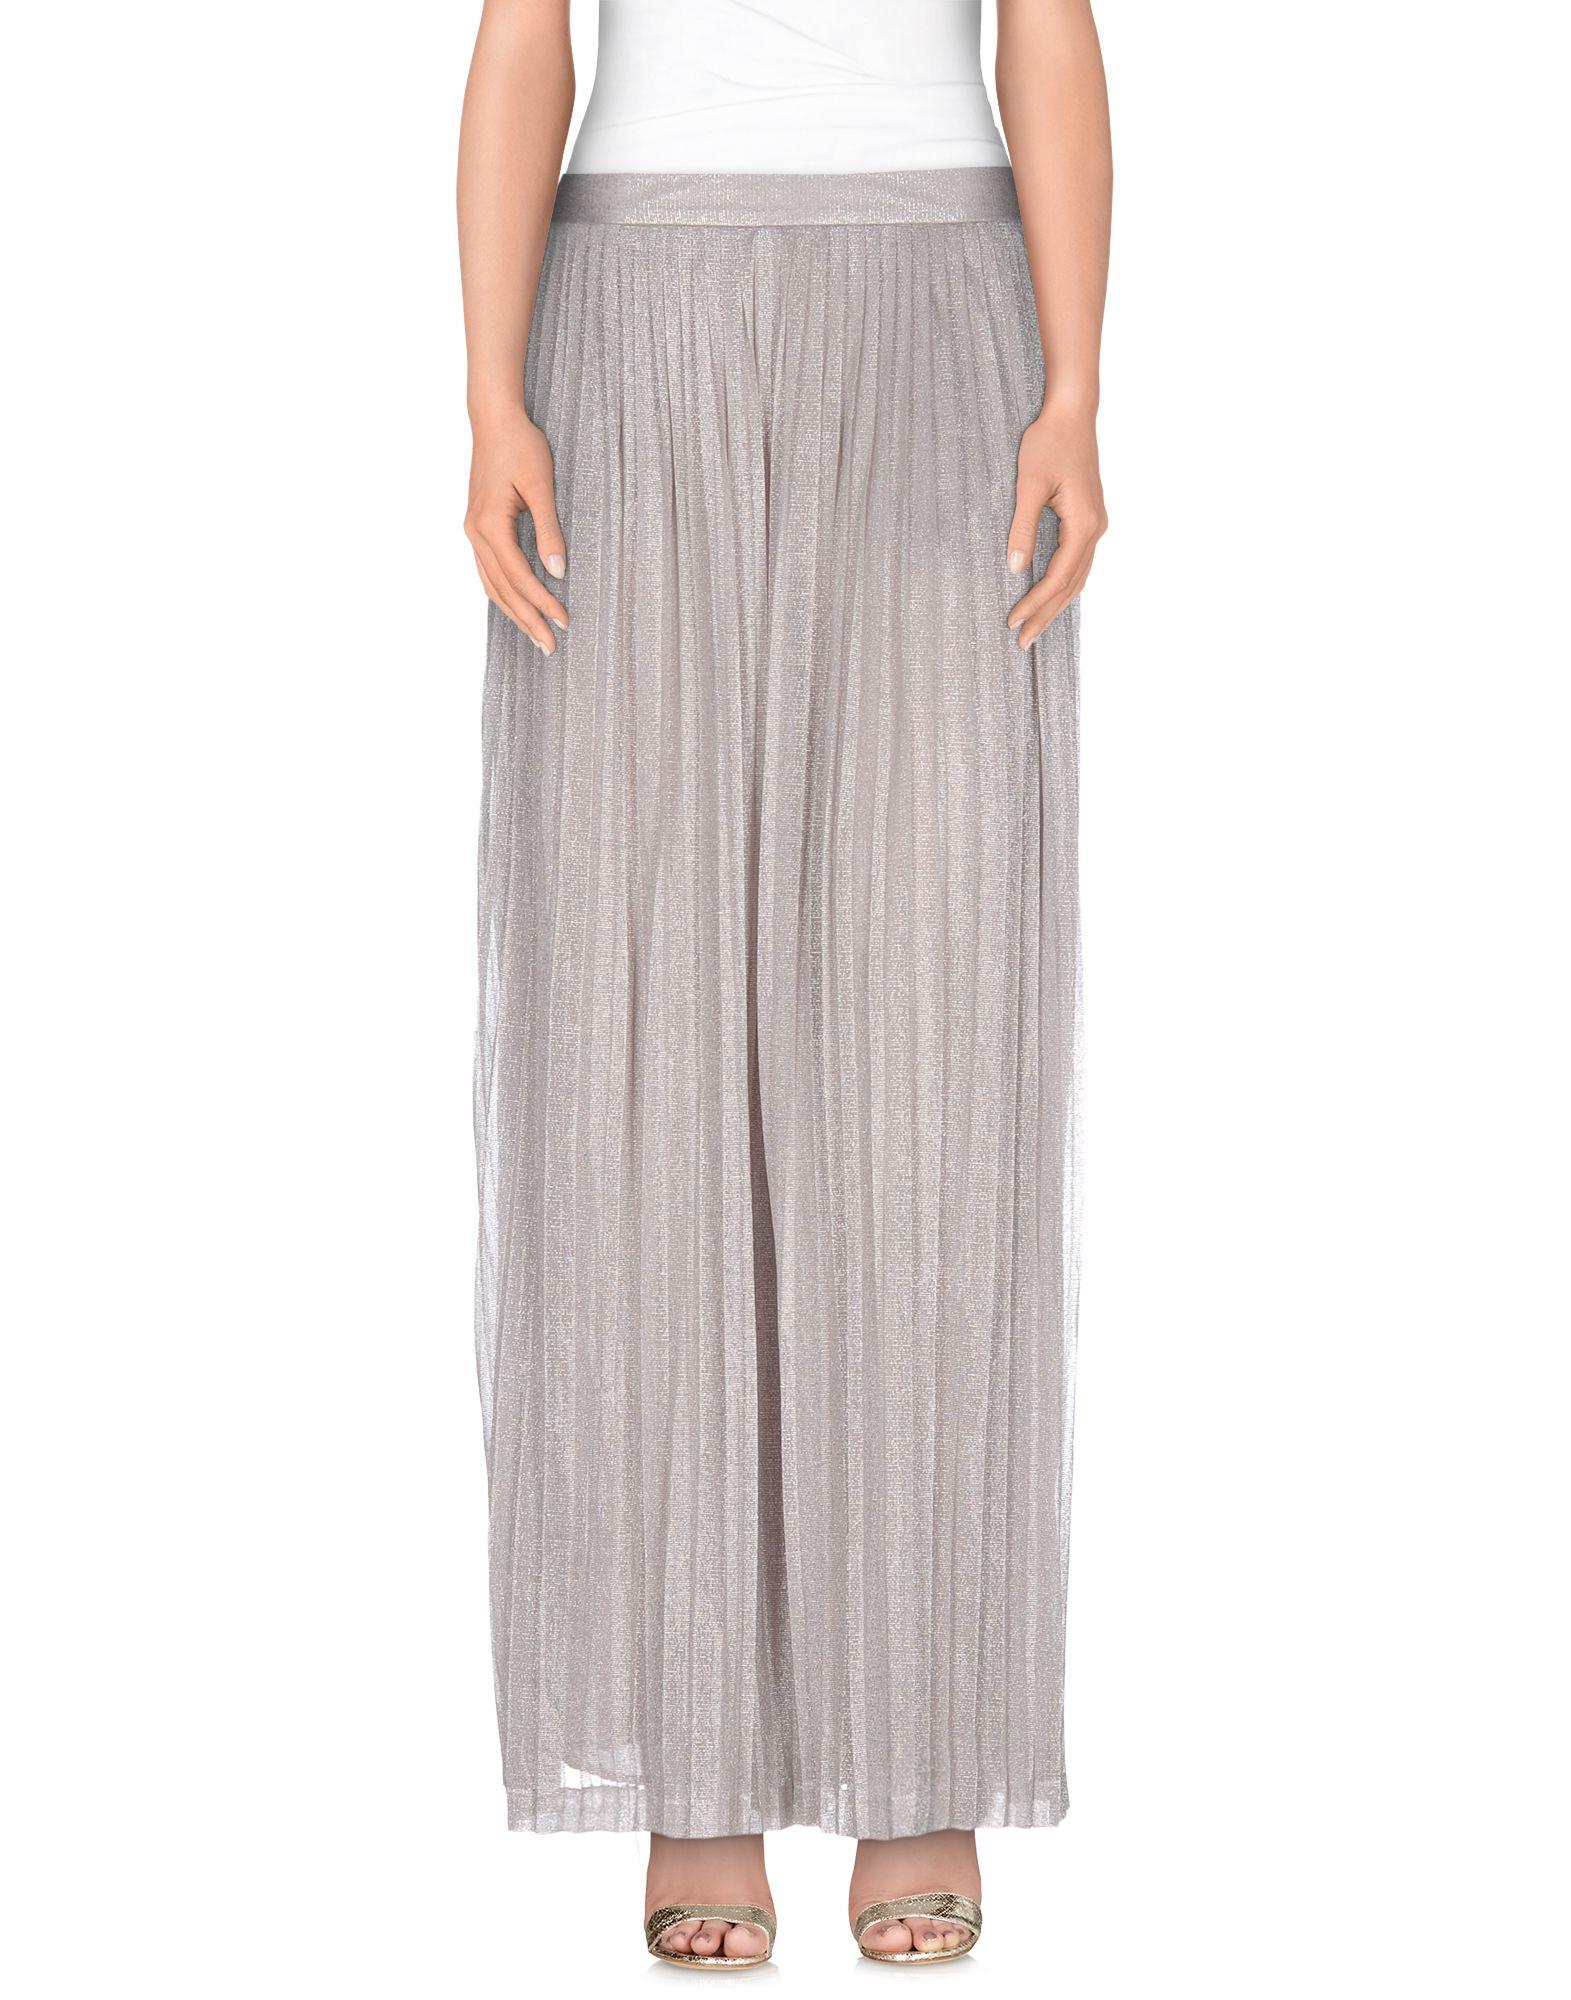 Long Grey Skirt 89